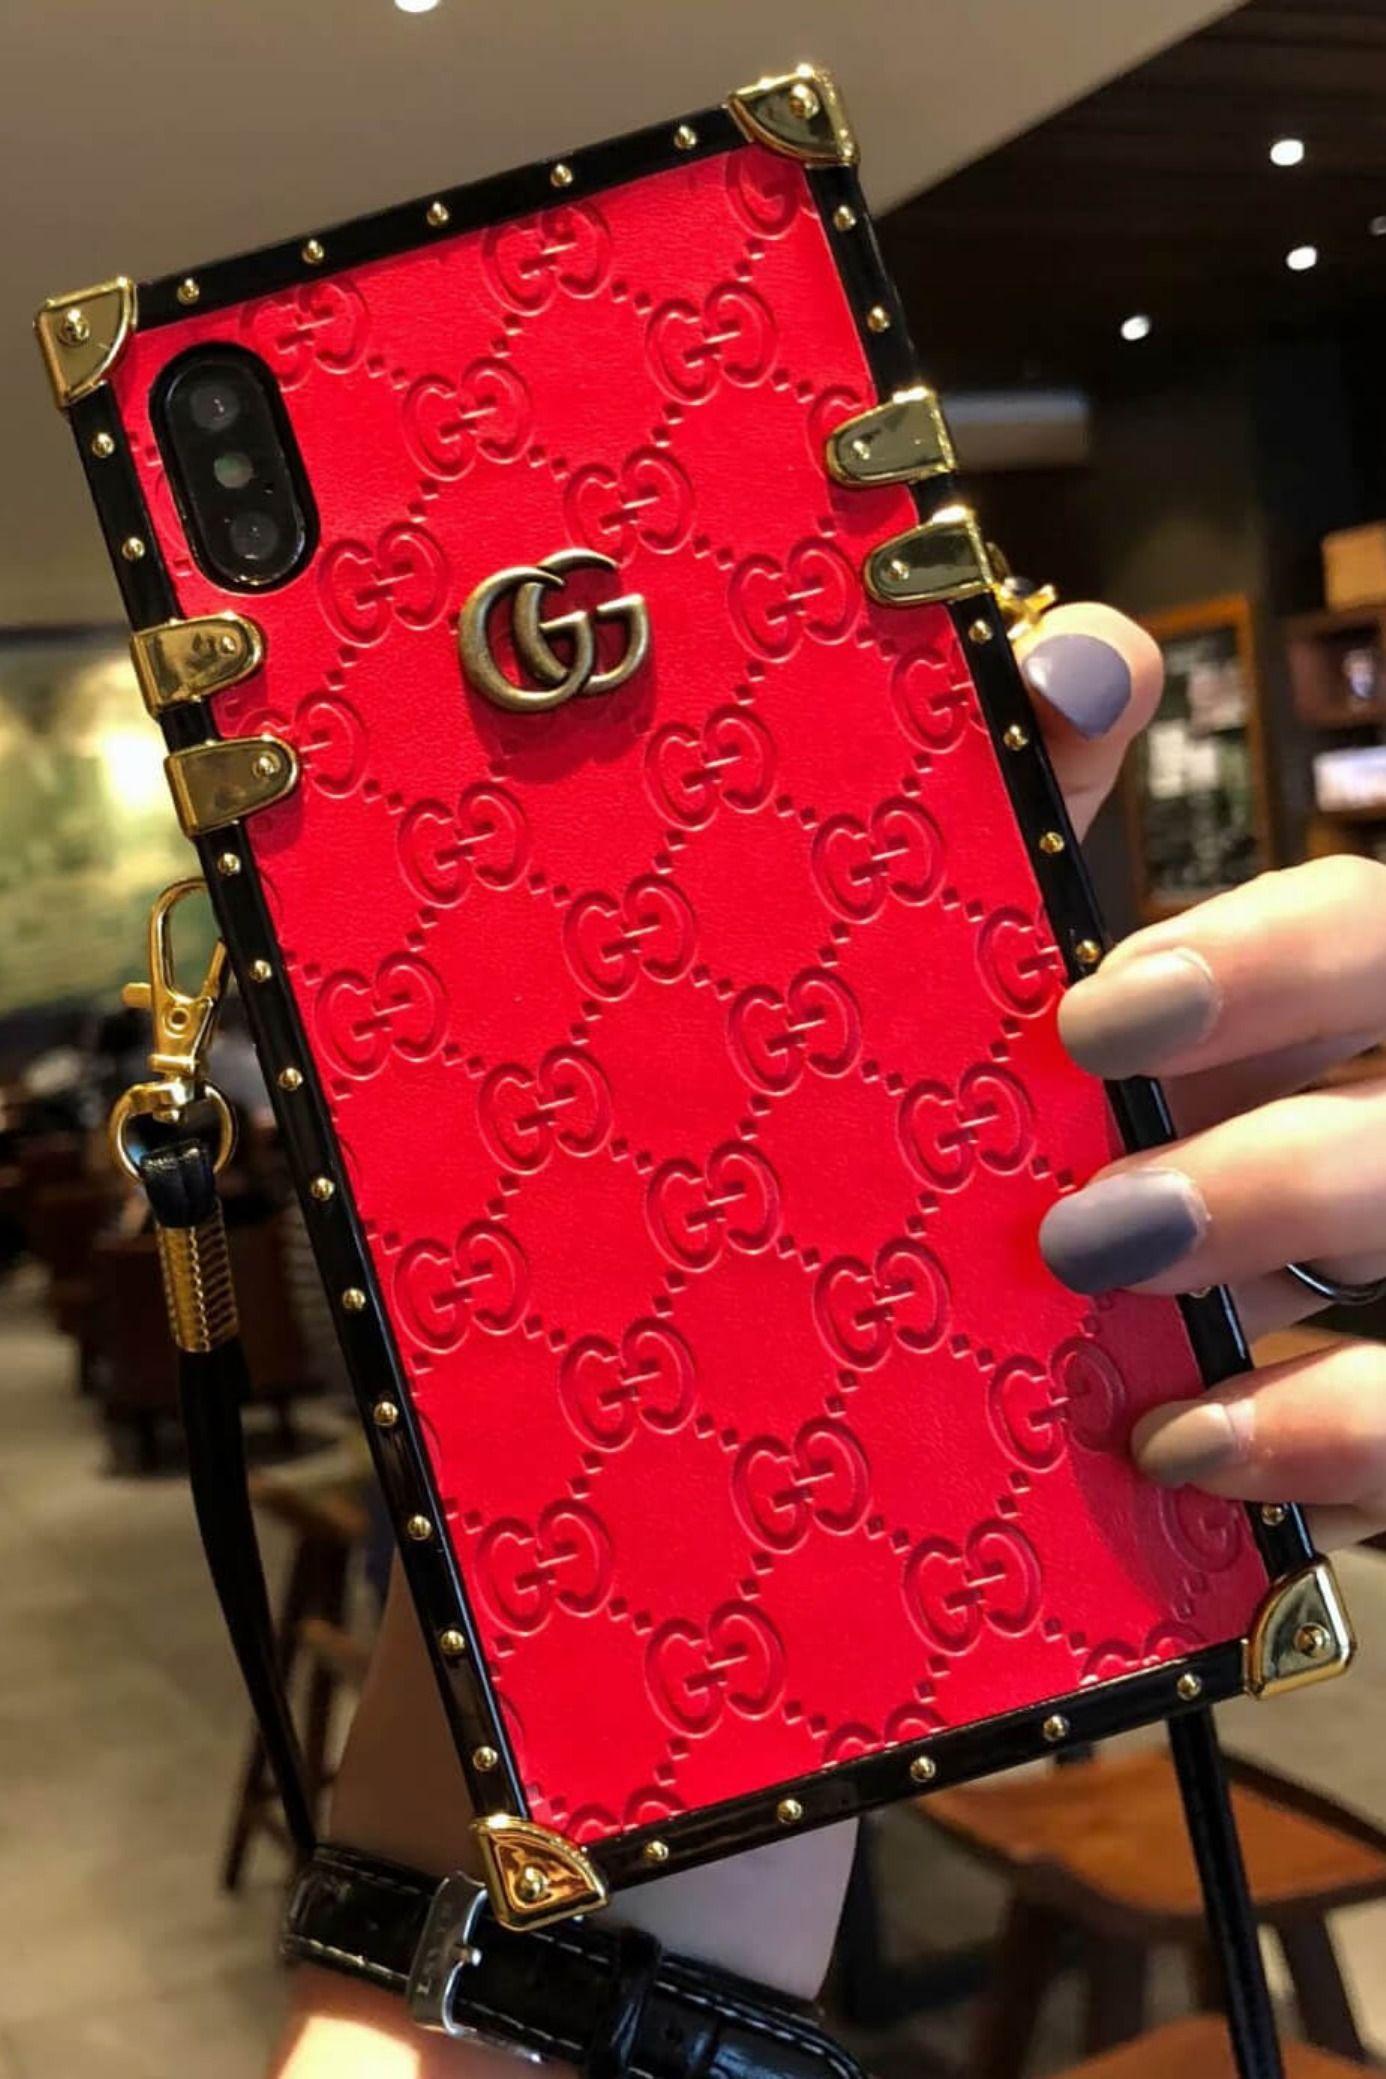 Gucci iphone case redblack 11 pro xs max xr 8 plus